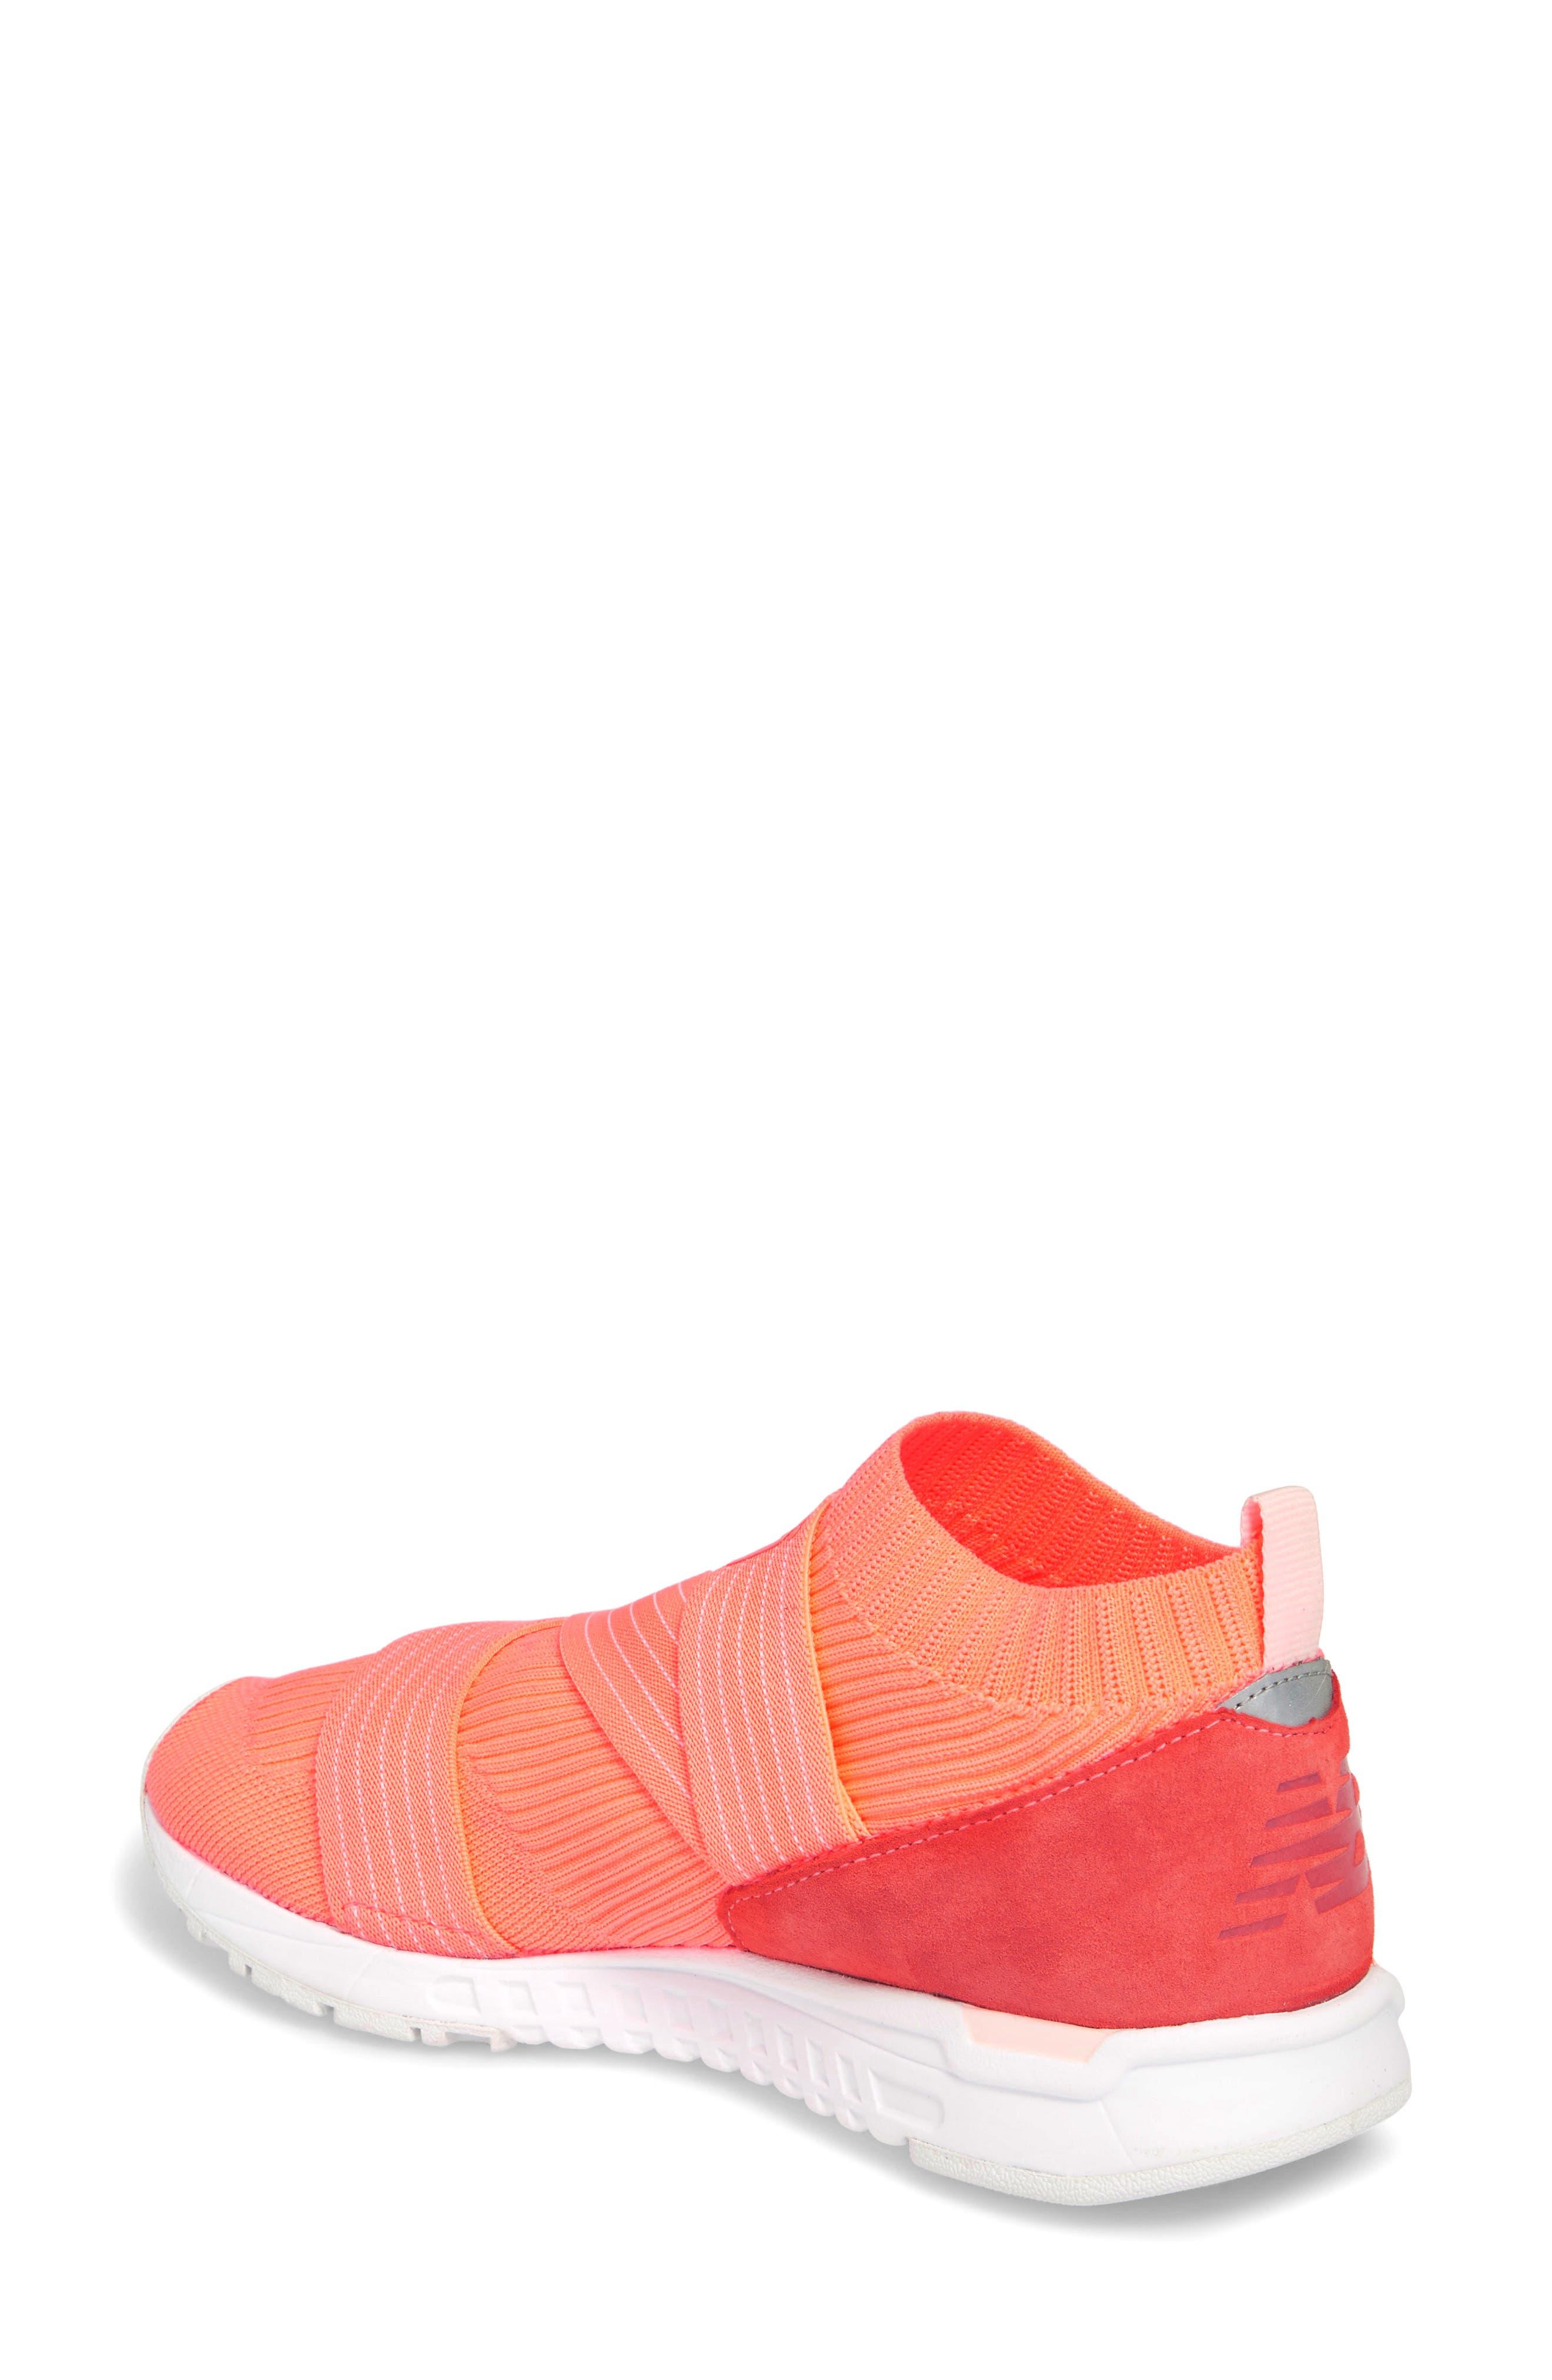 247 Knit Sneaker,                             Alternate thumbnail 4, color,